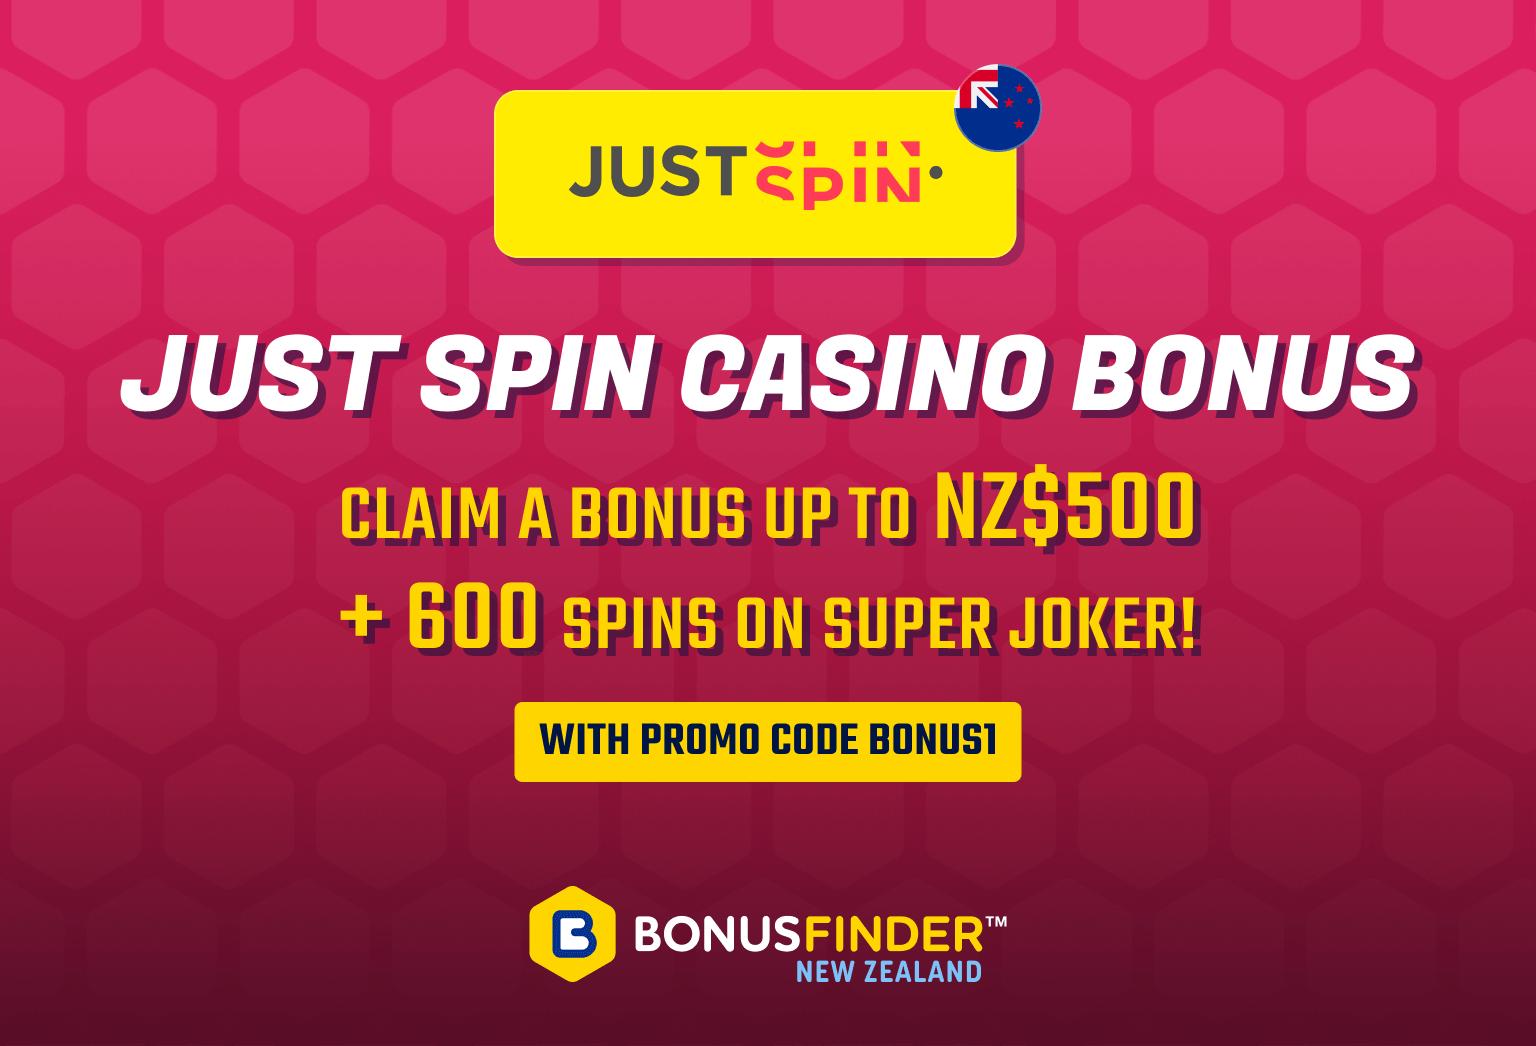 just spin bonus